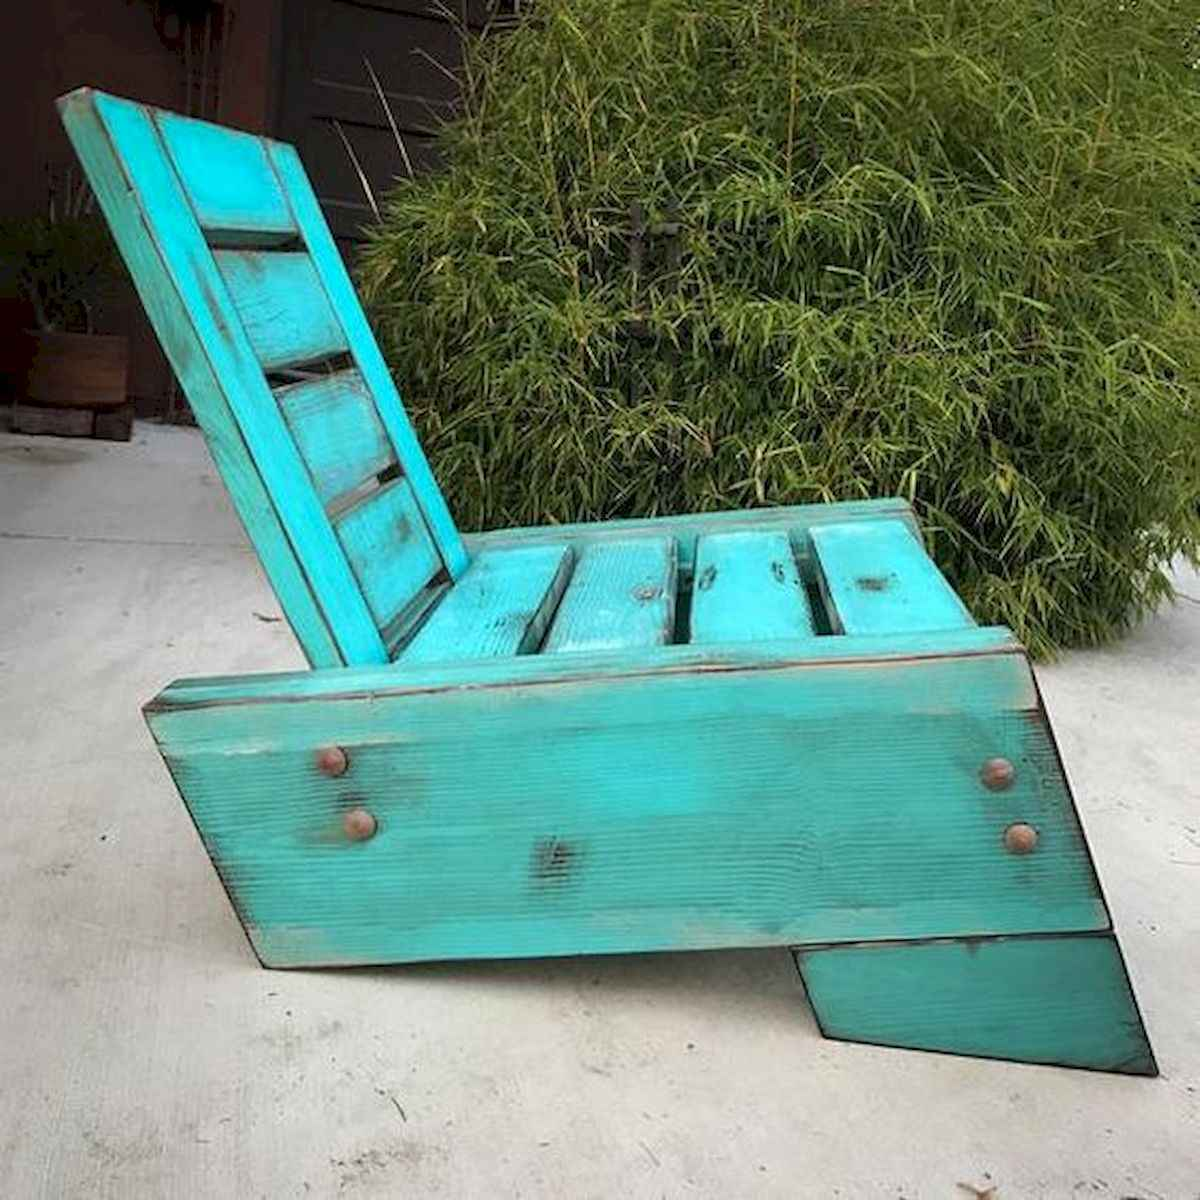 60 Amazing DIY Projects Otdoors Furniture Design Ideas (26)